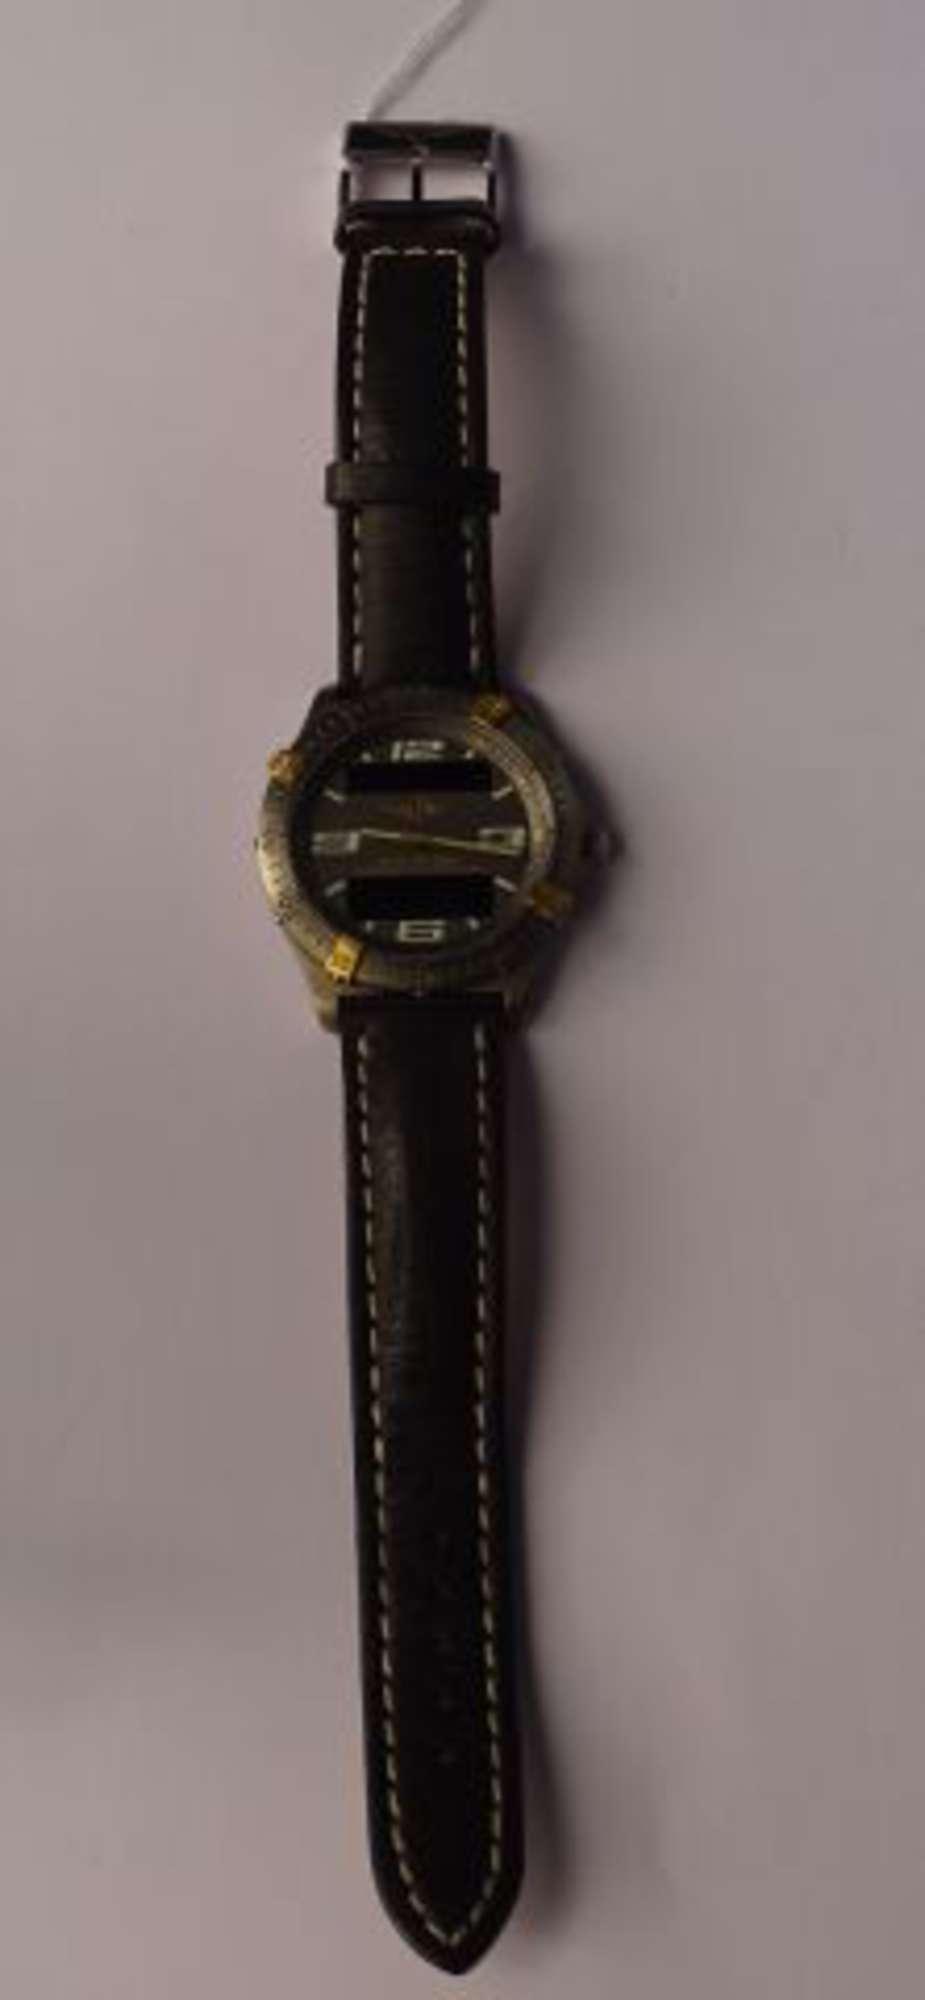 breitling chronom tre a rospace ann es 90 montre bracelet boitier titane cadran gris sign. Black Bedroom Furniture Sets. Home Design Ideas